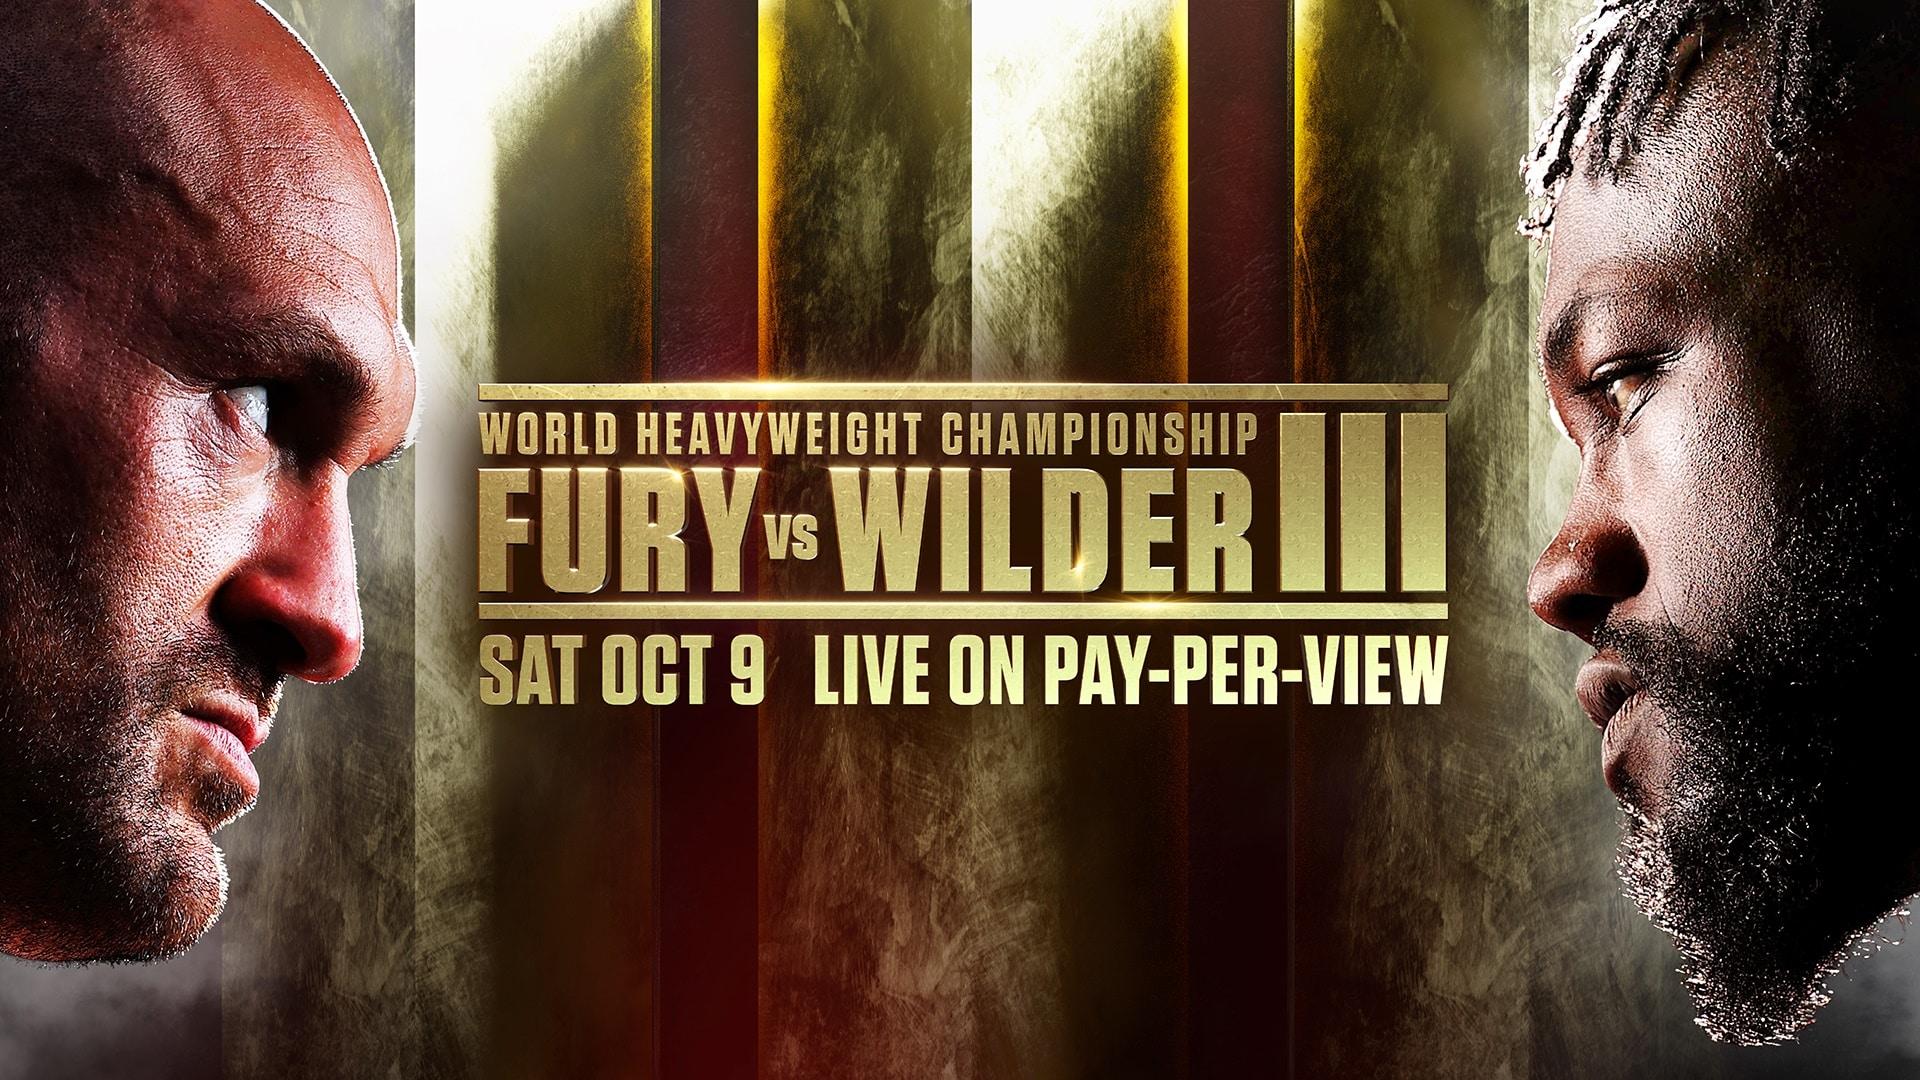 Wilder-vs-fury-3